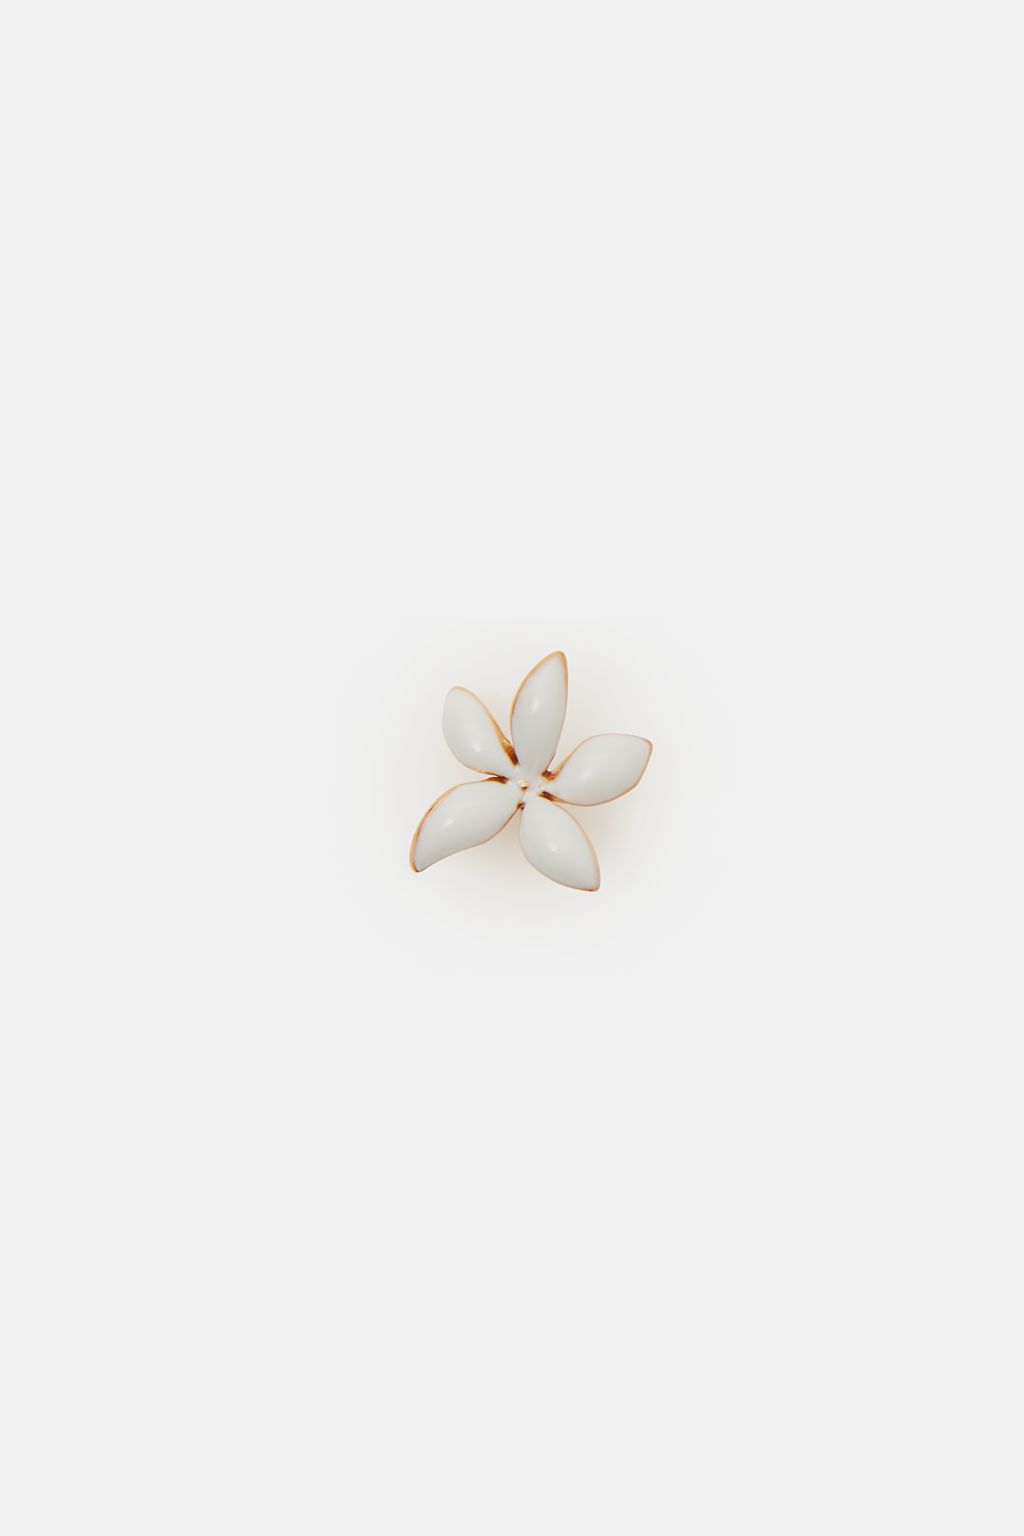 Falling Jasmine small single earring